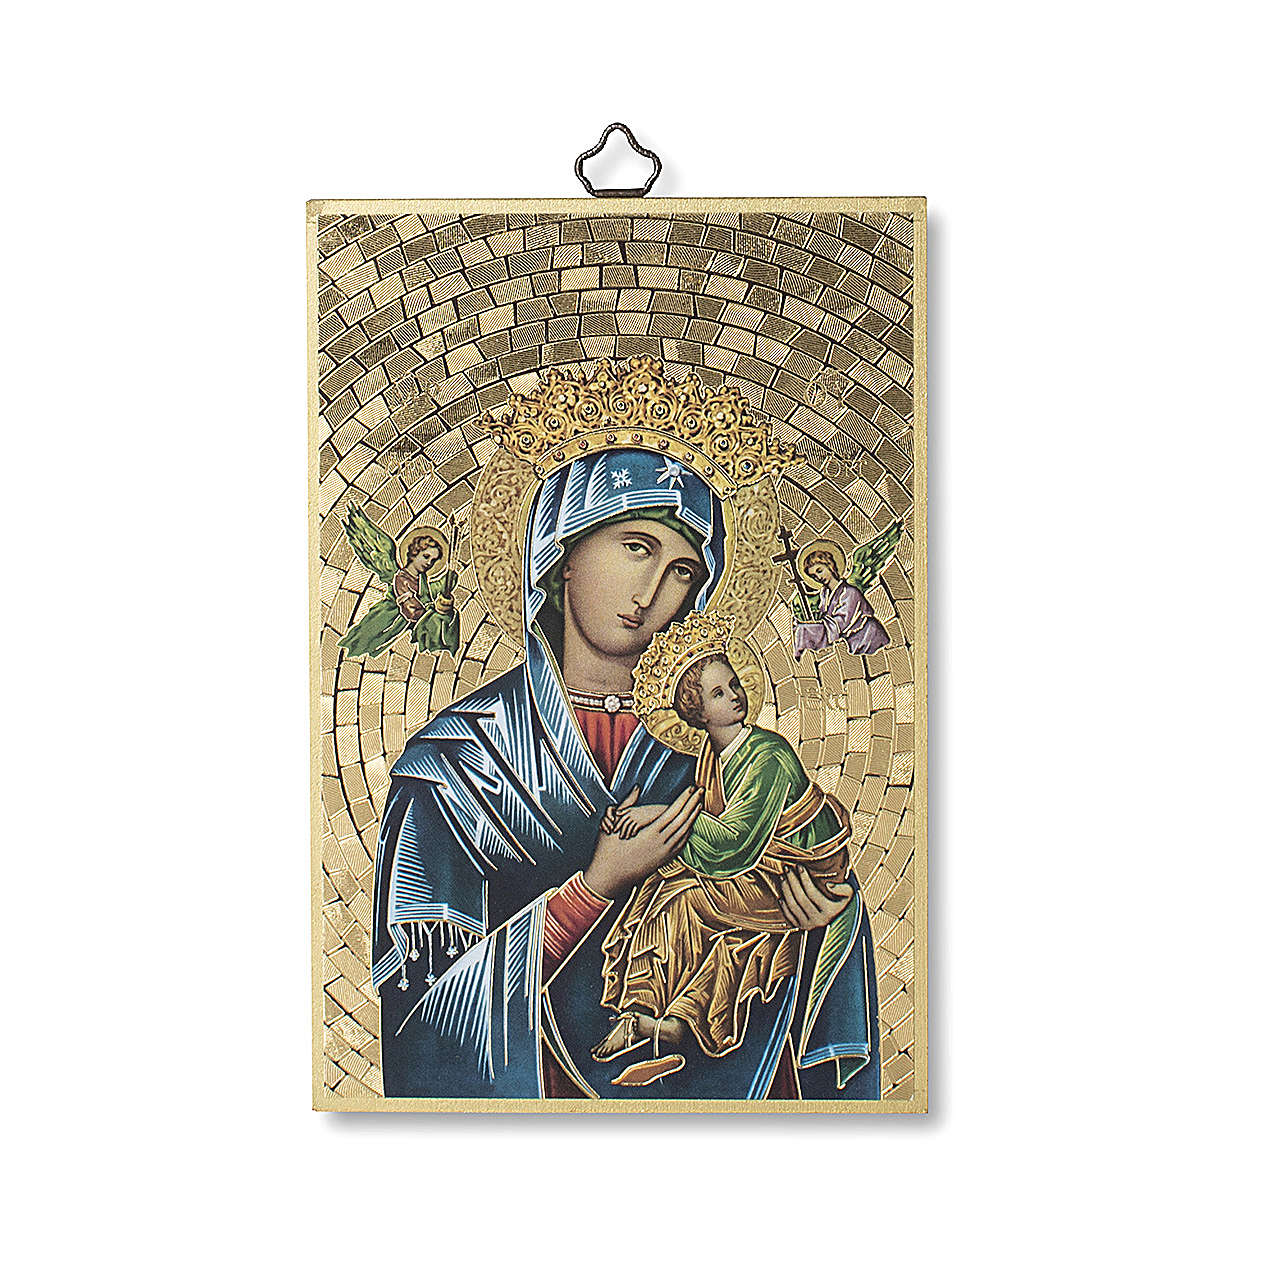 Stampa su legno Madonna del Perpetuo Soccorso 3